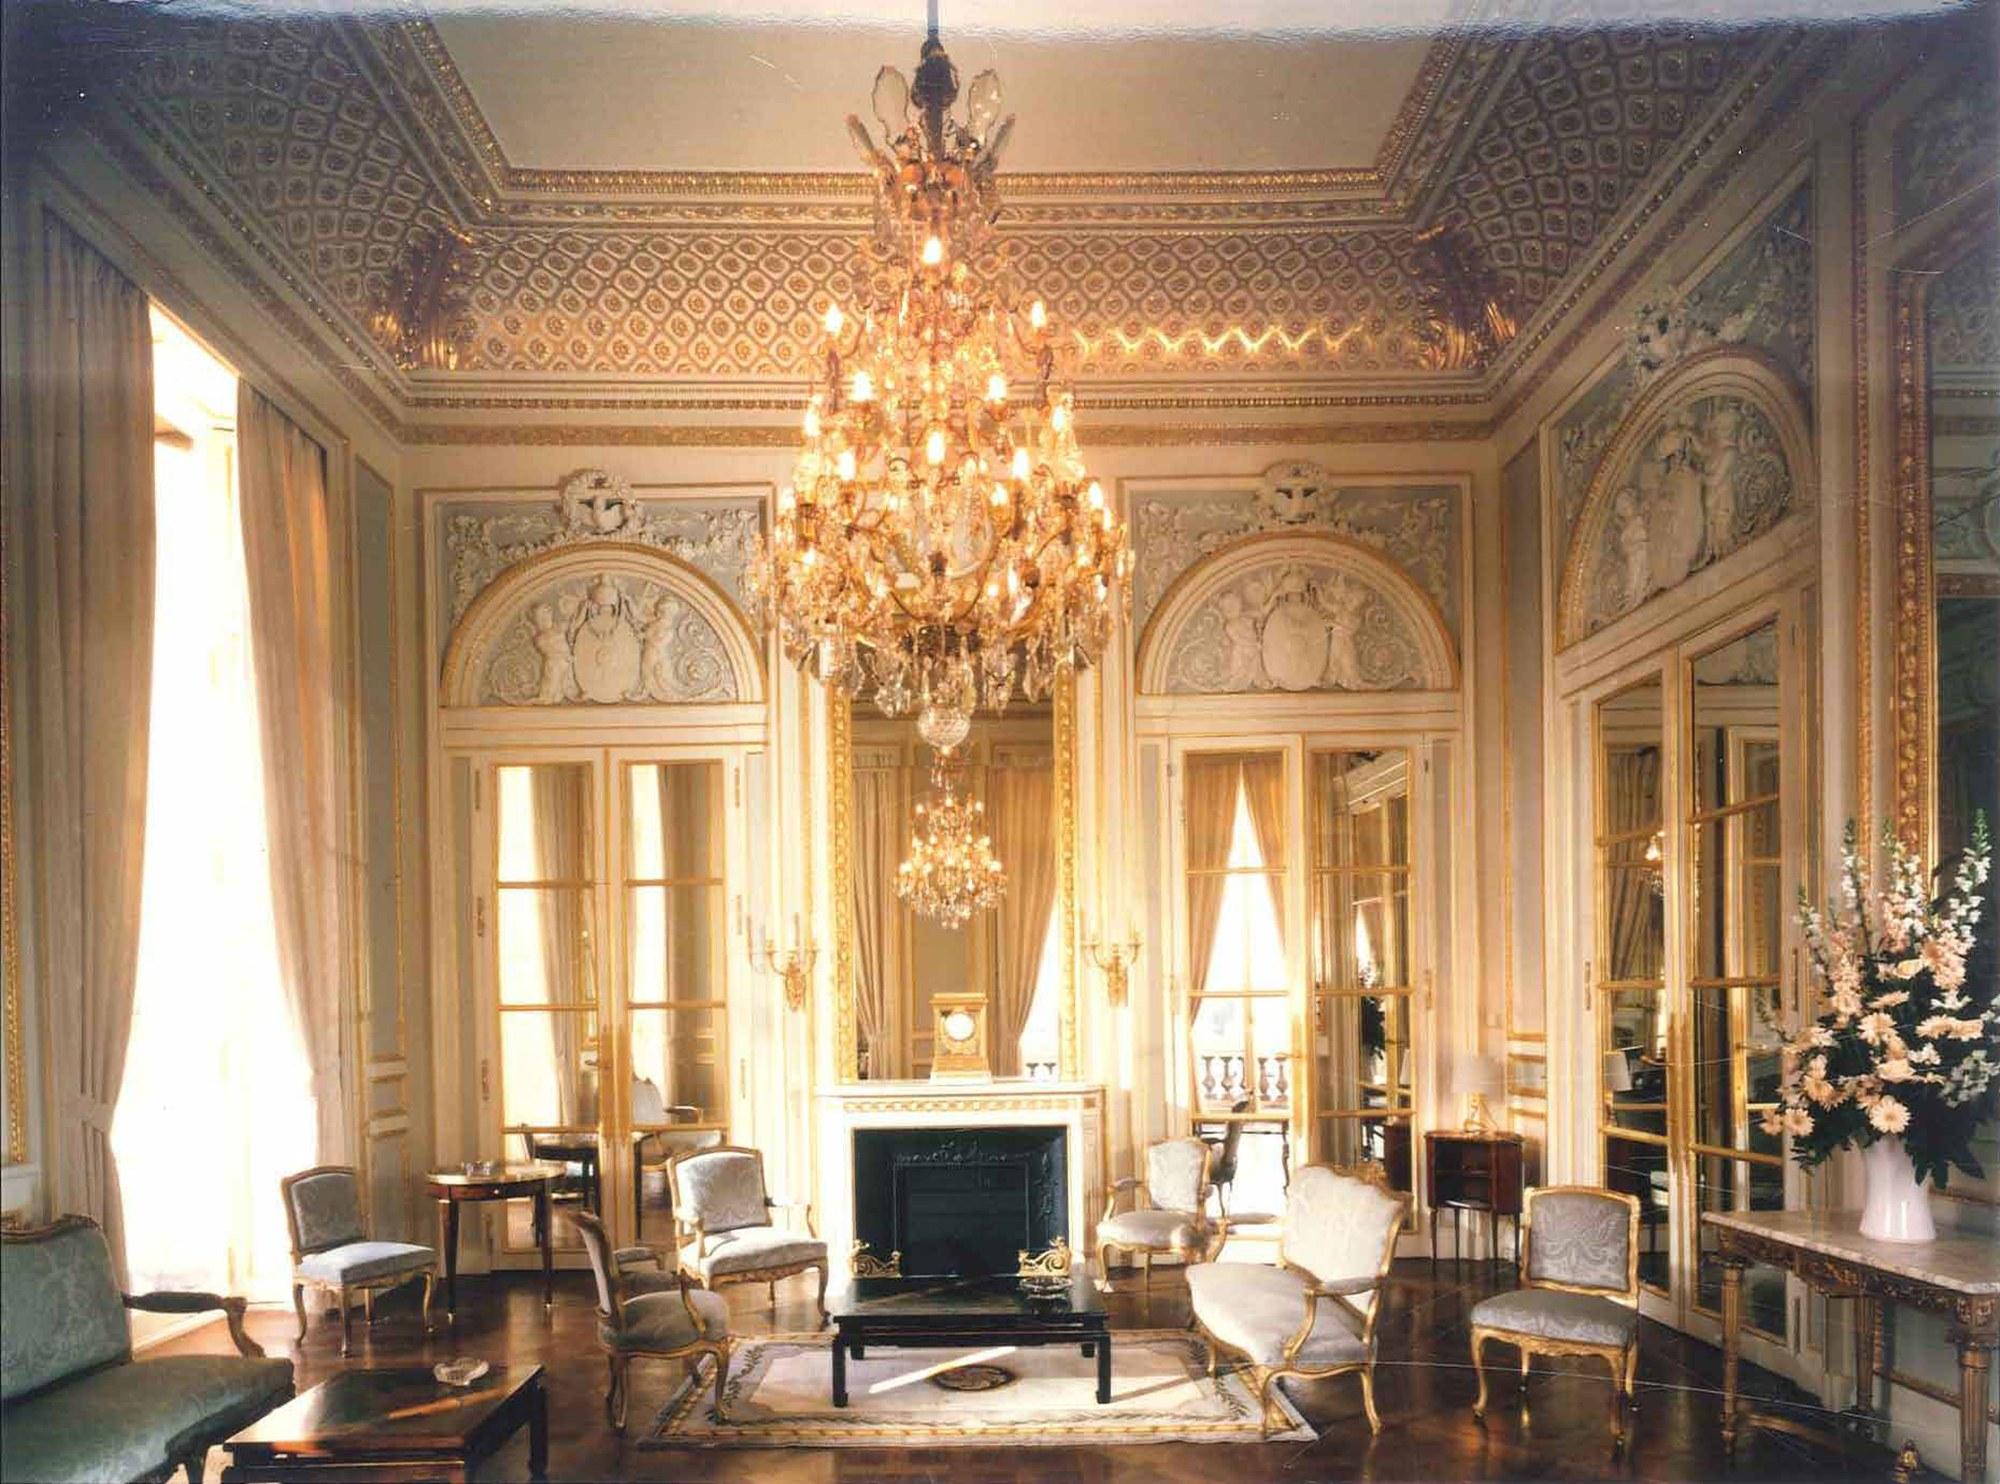 HOTEL DE CRILLON PARIS - EVENT